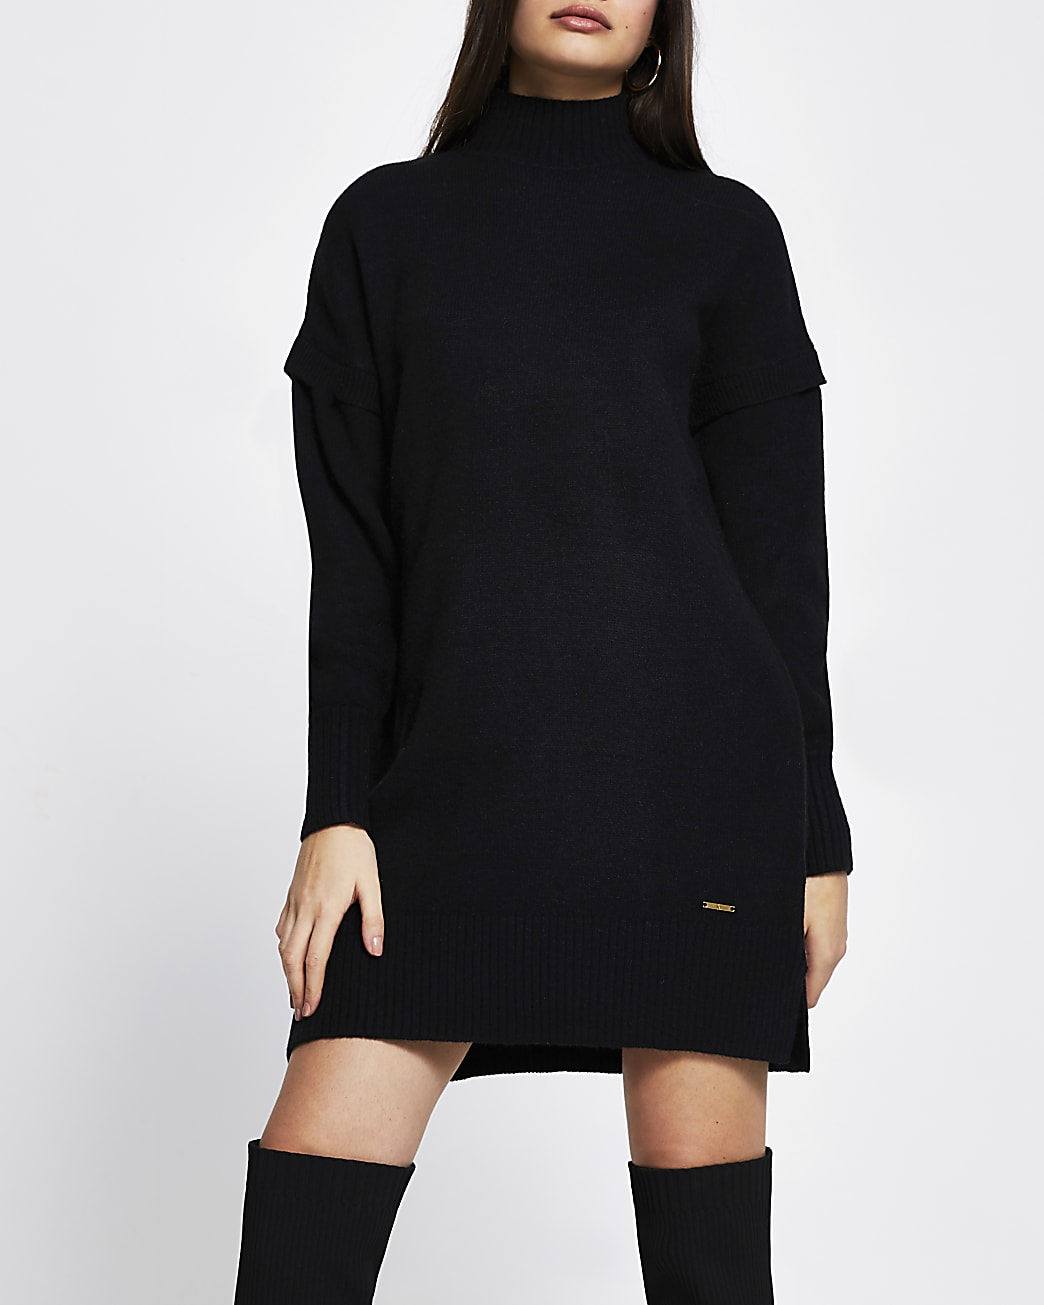 Black long sleeve mini jumper dress